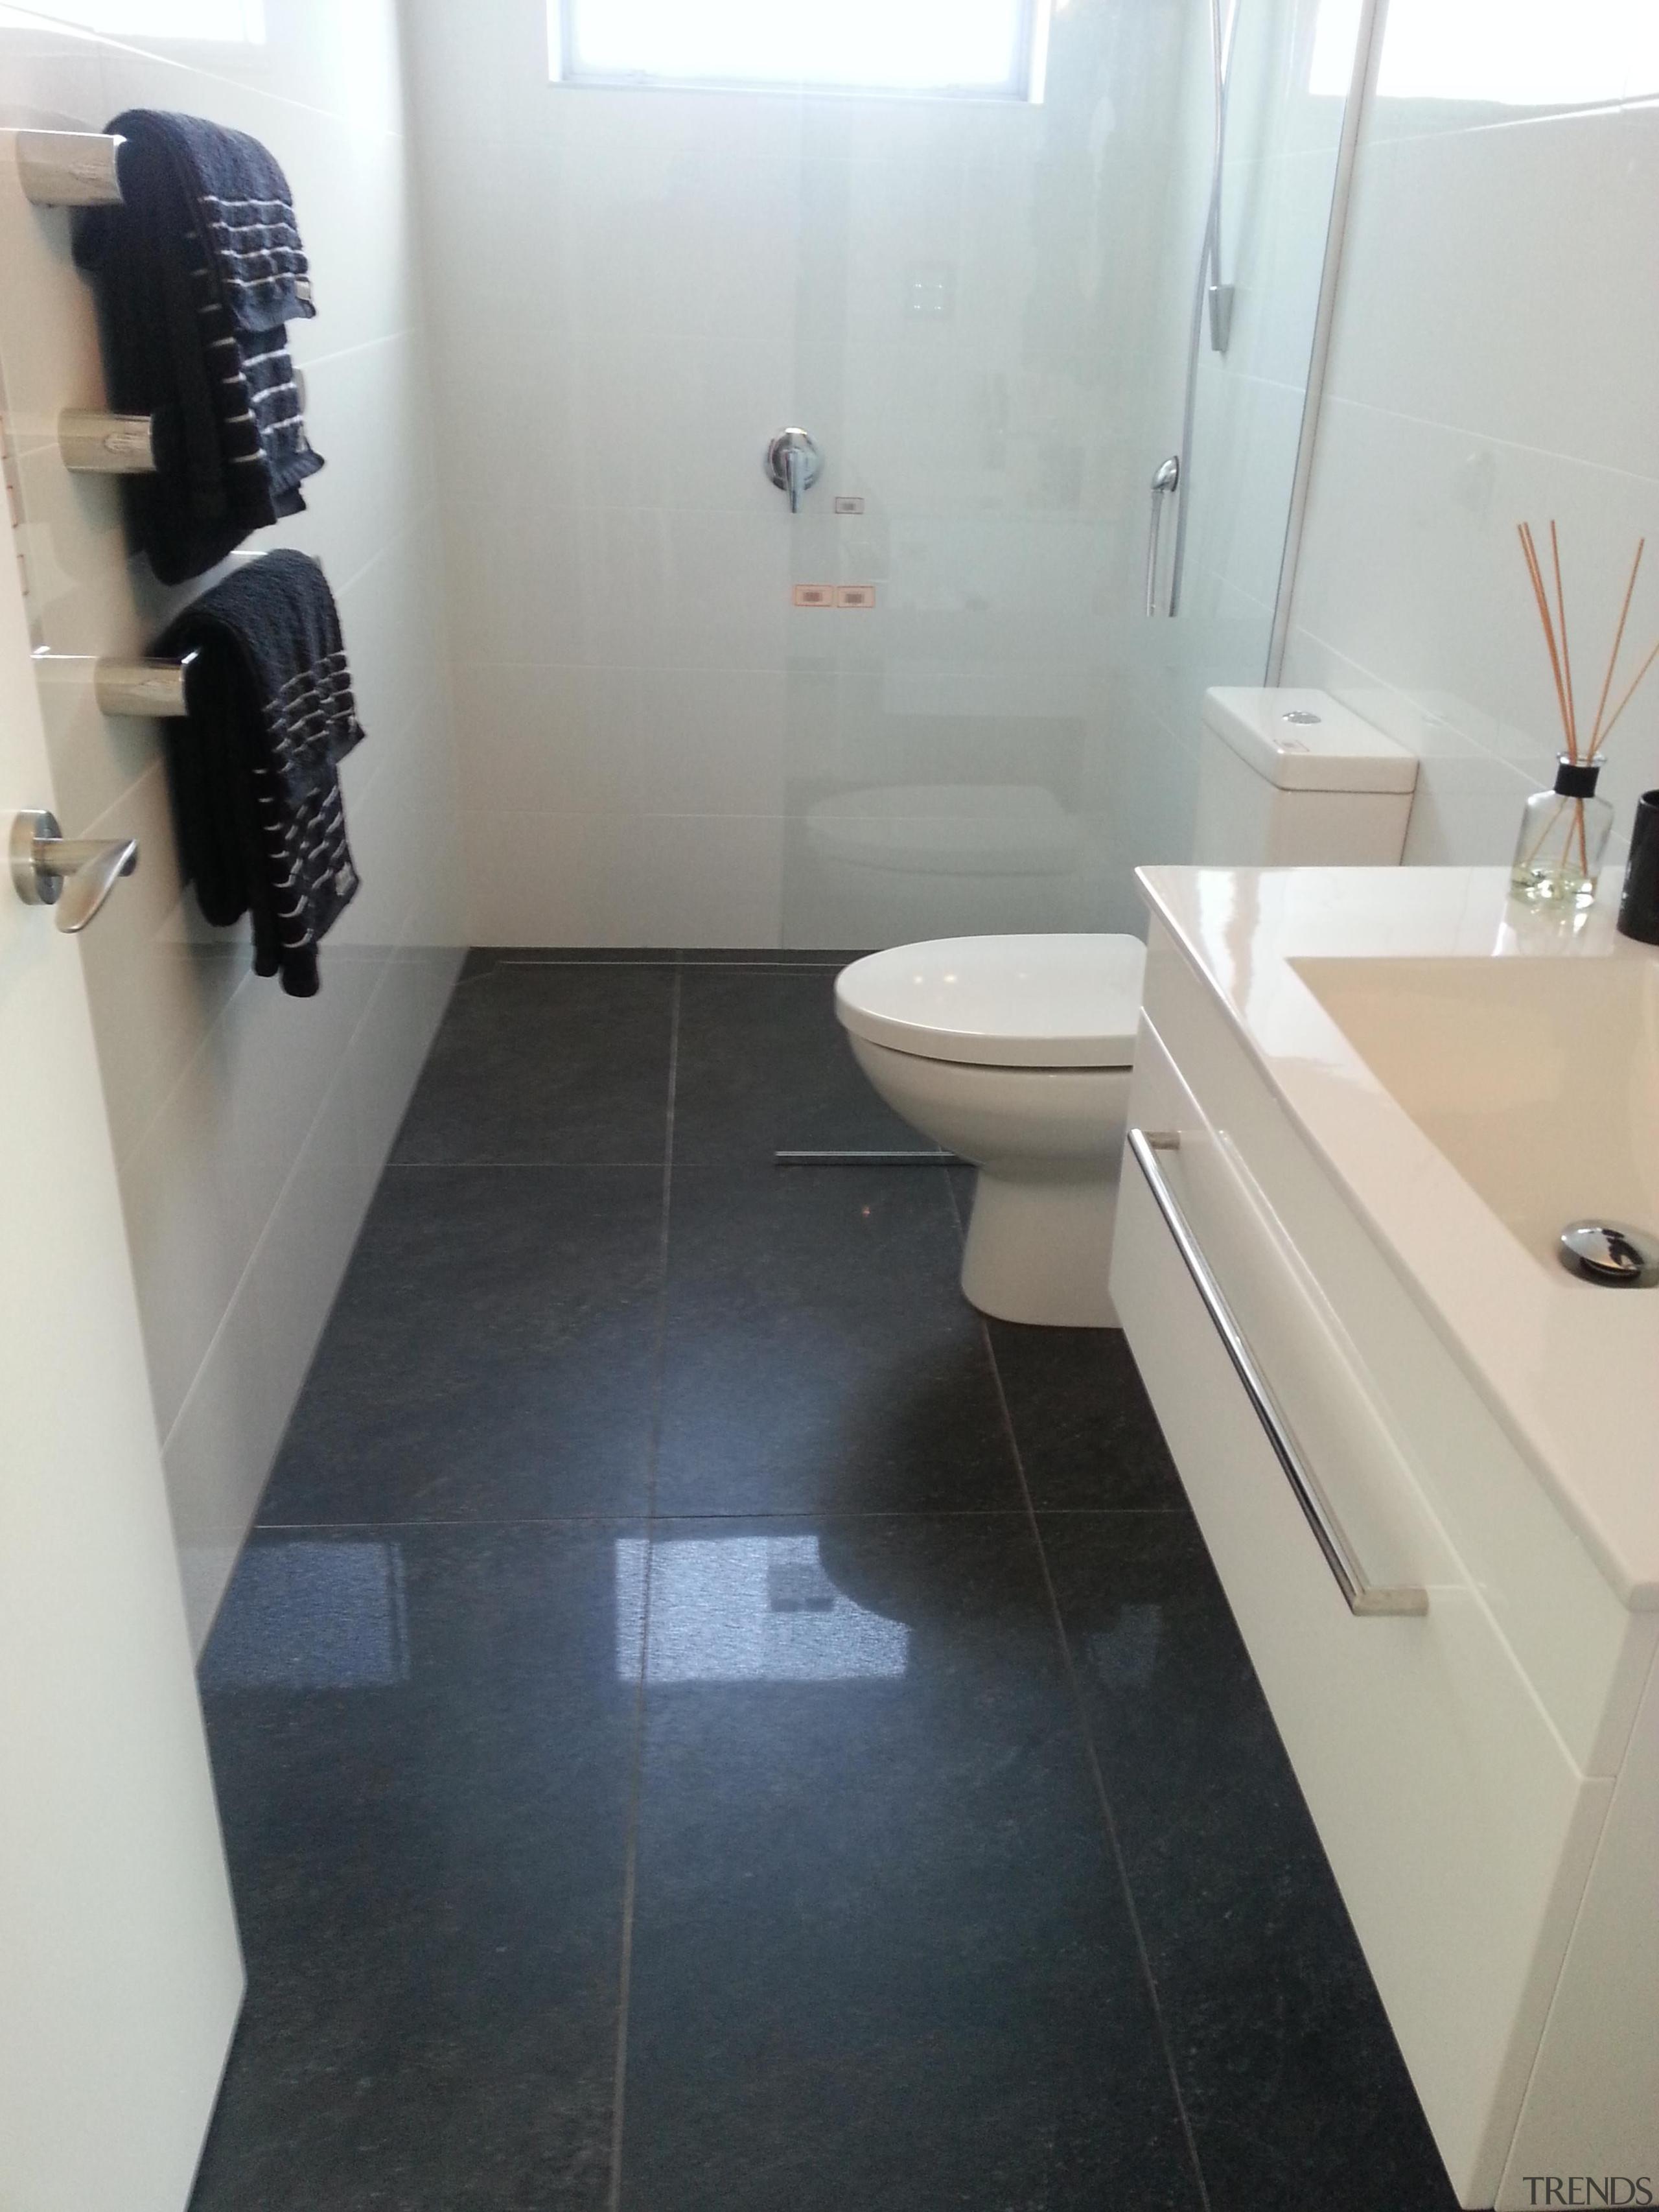 Anthracite bathroom floor and Easy White Gloss wall. bathroom, floor, flooring, hardwood, interior design, plumbing fixture, property, room, sink, tile, gray, black